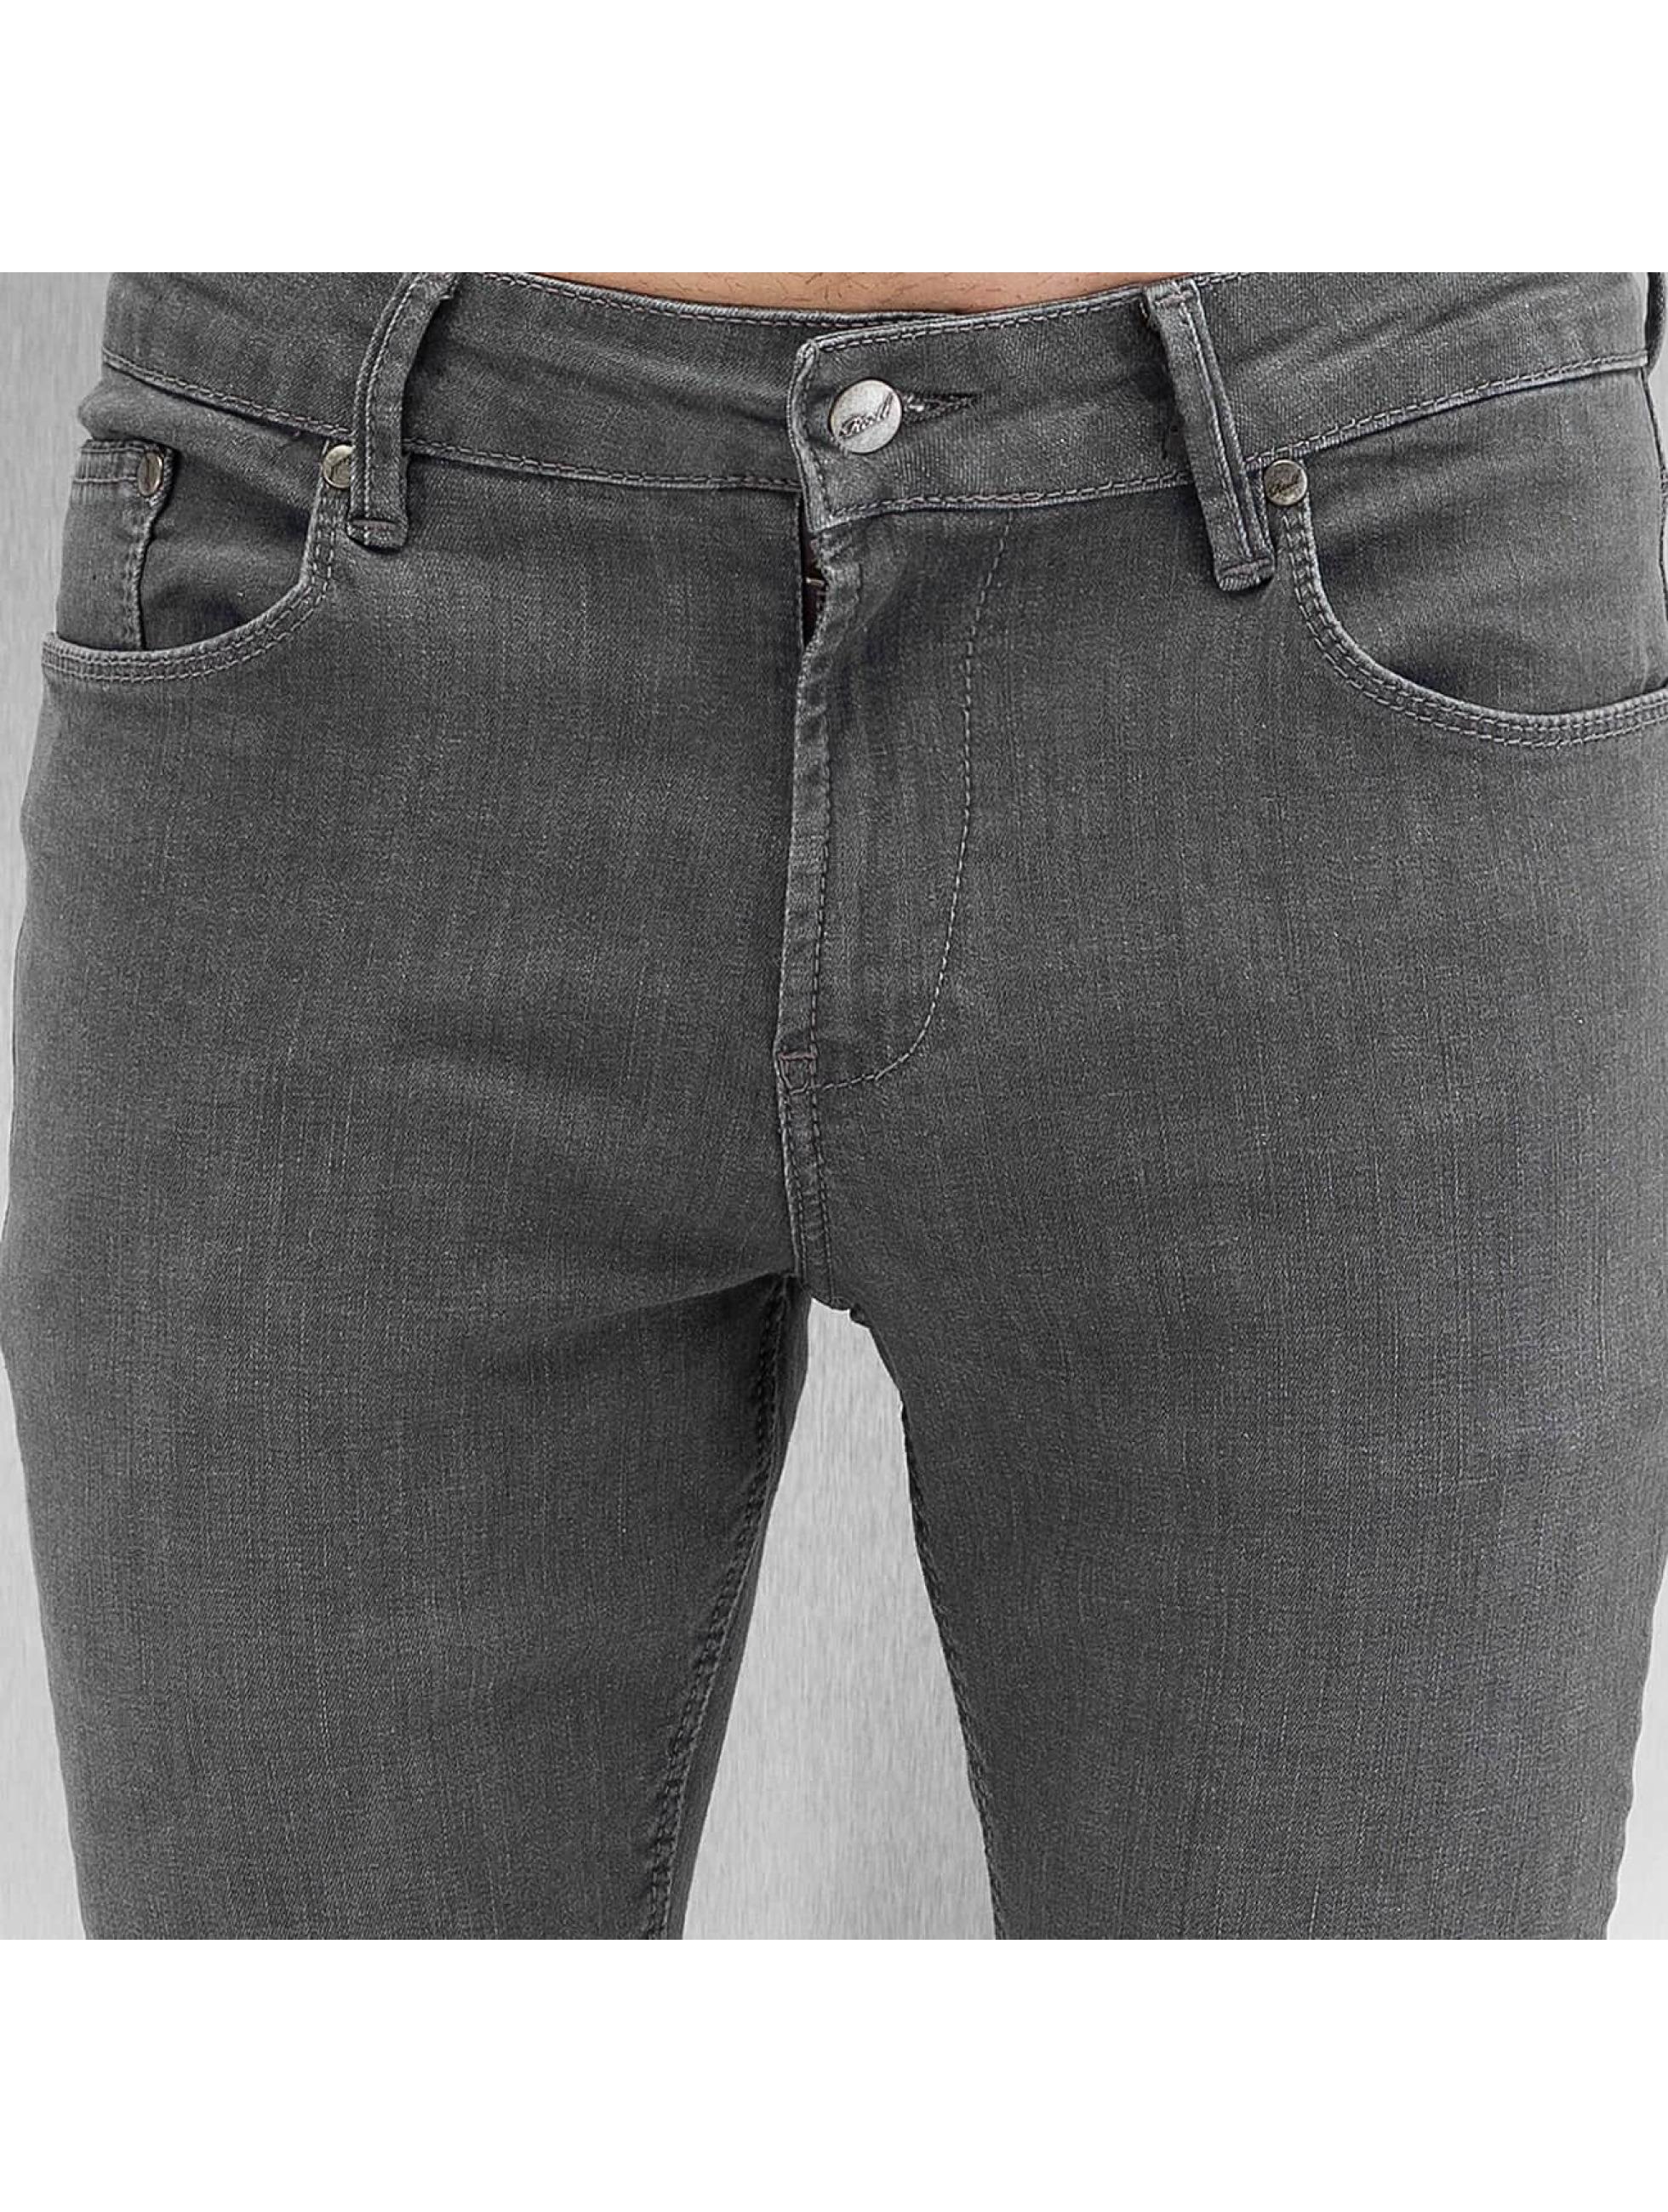 Reell Jeans Skinny Jeans Radar Stretch Super Slim Fit grey